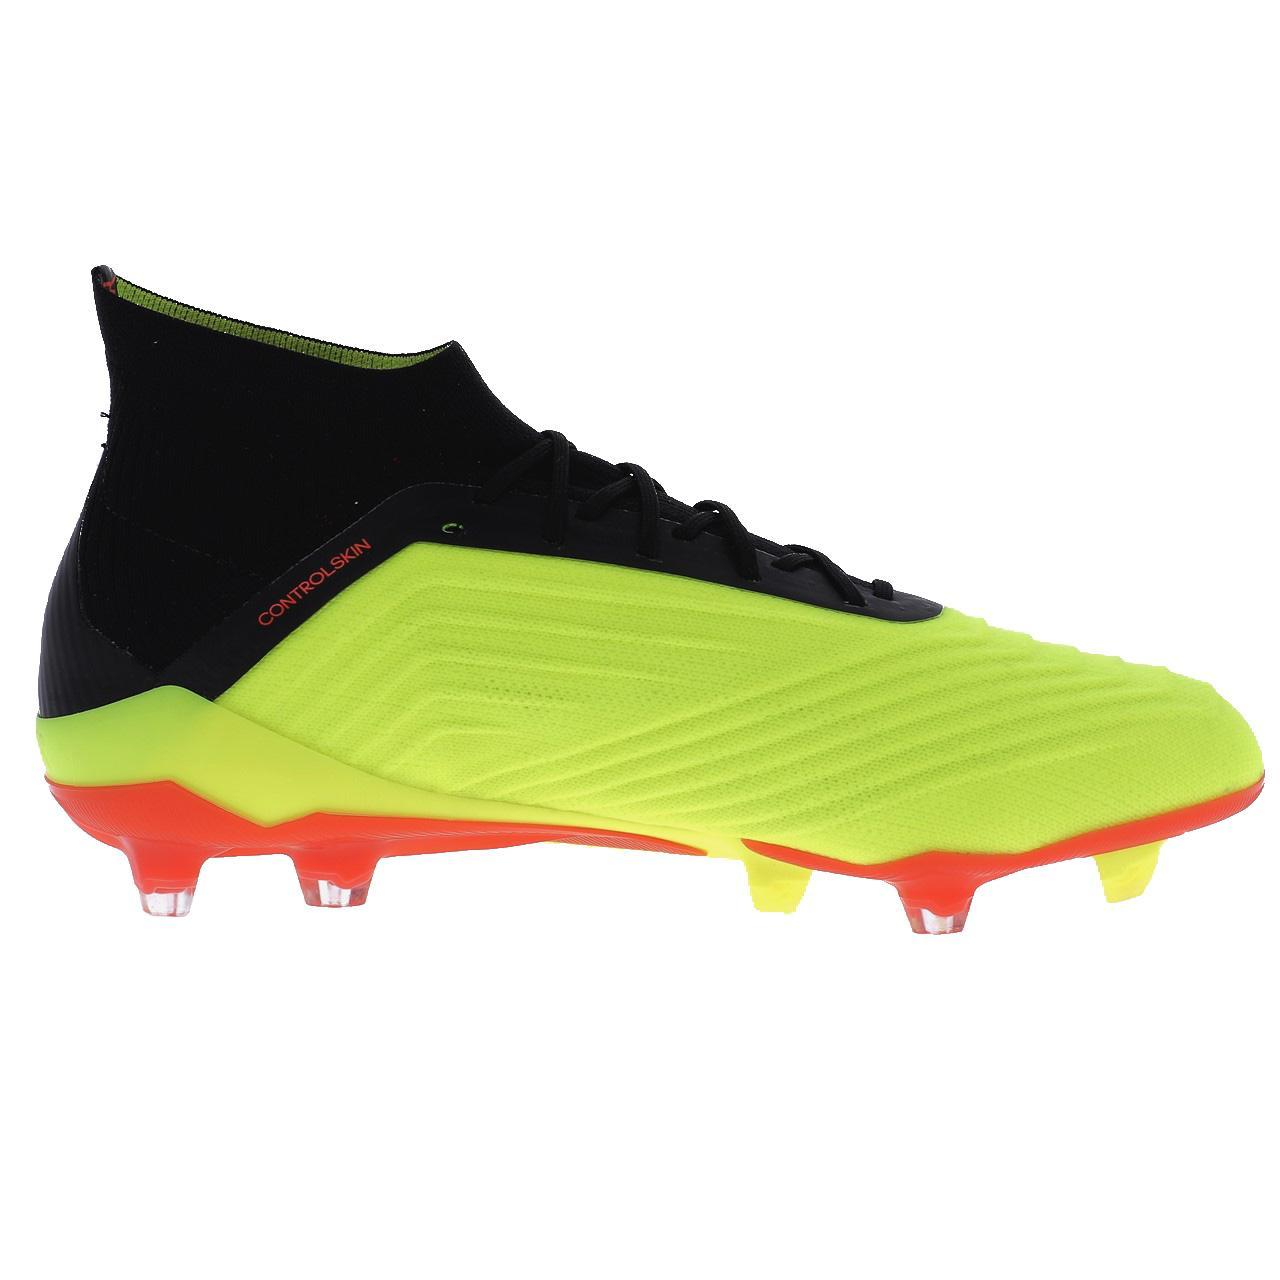 Football-Shoes-Flap-Adidas-Predator-18-1-Fg-Syello-Yellow-47849-New thumbnail 3